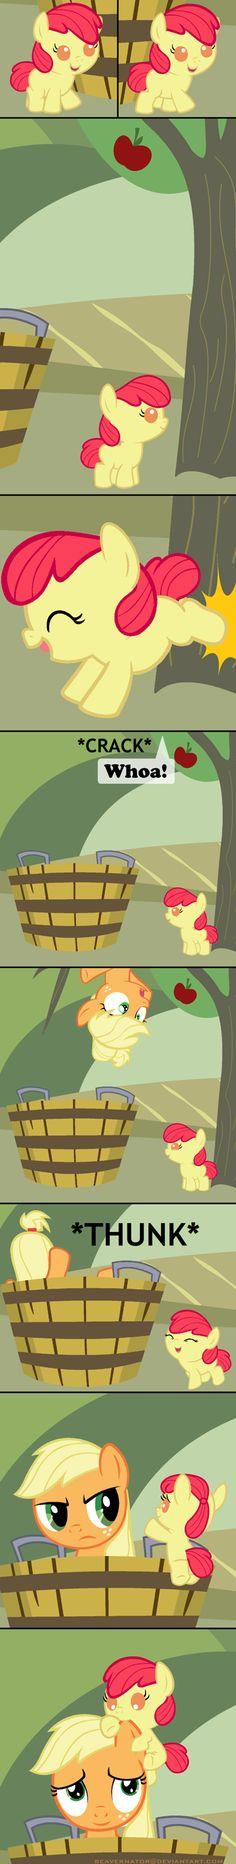 Applejack Bucking Season